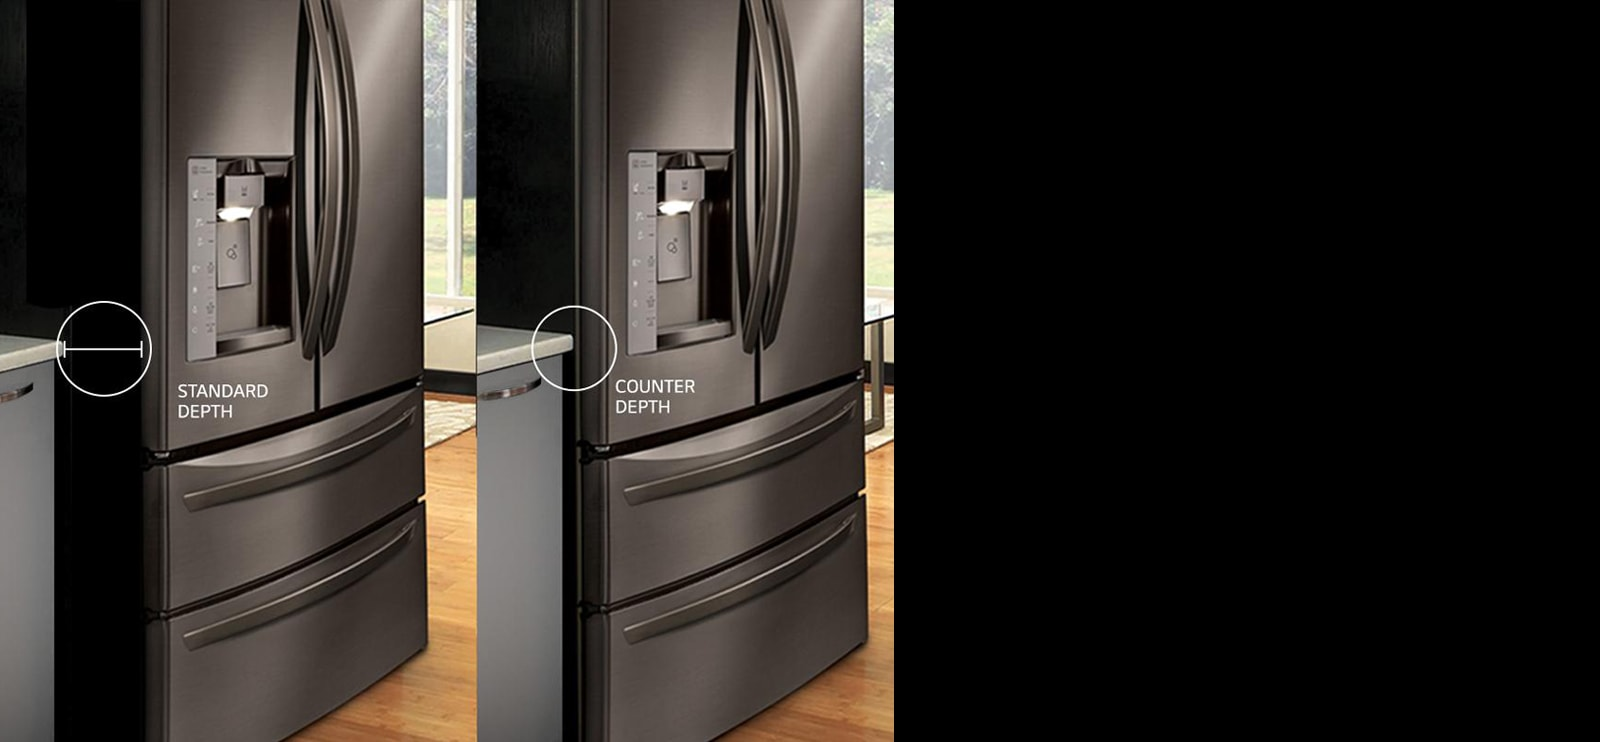 Counter Depth Vs Standard Depth Refrigerator Best